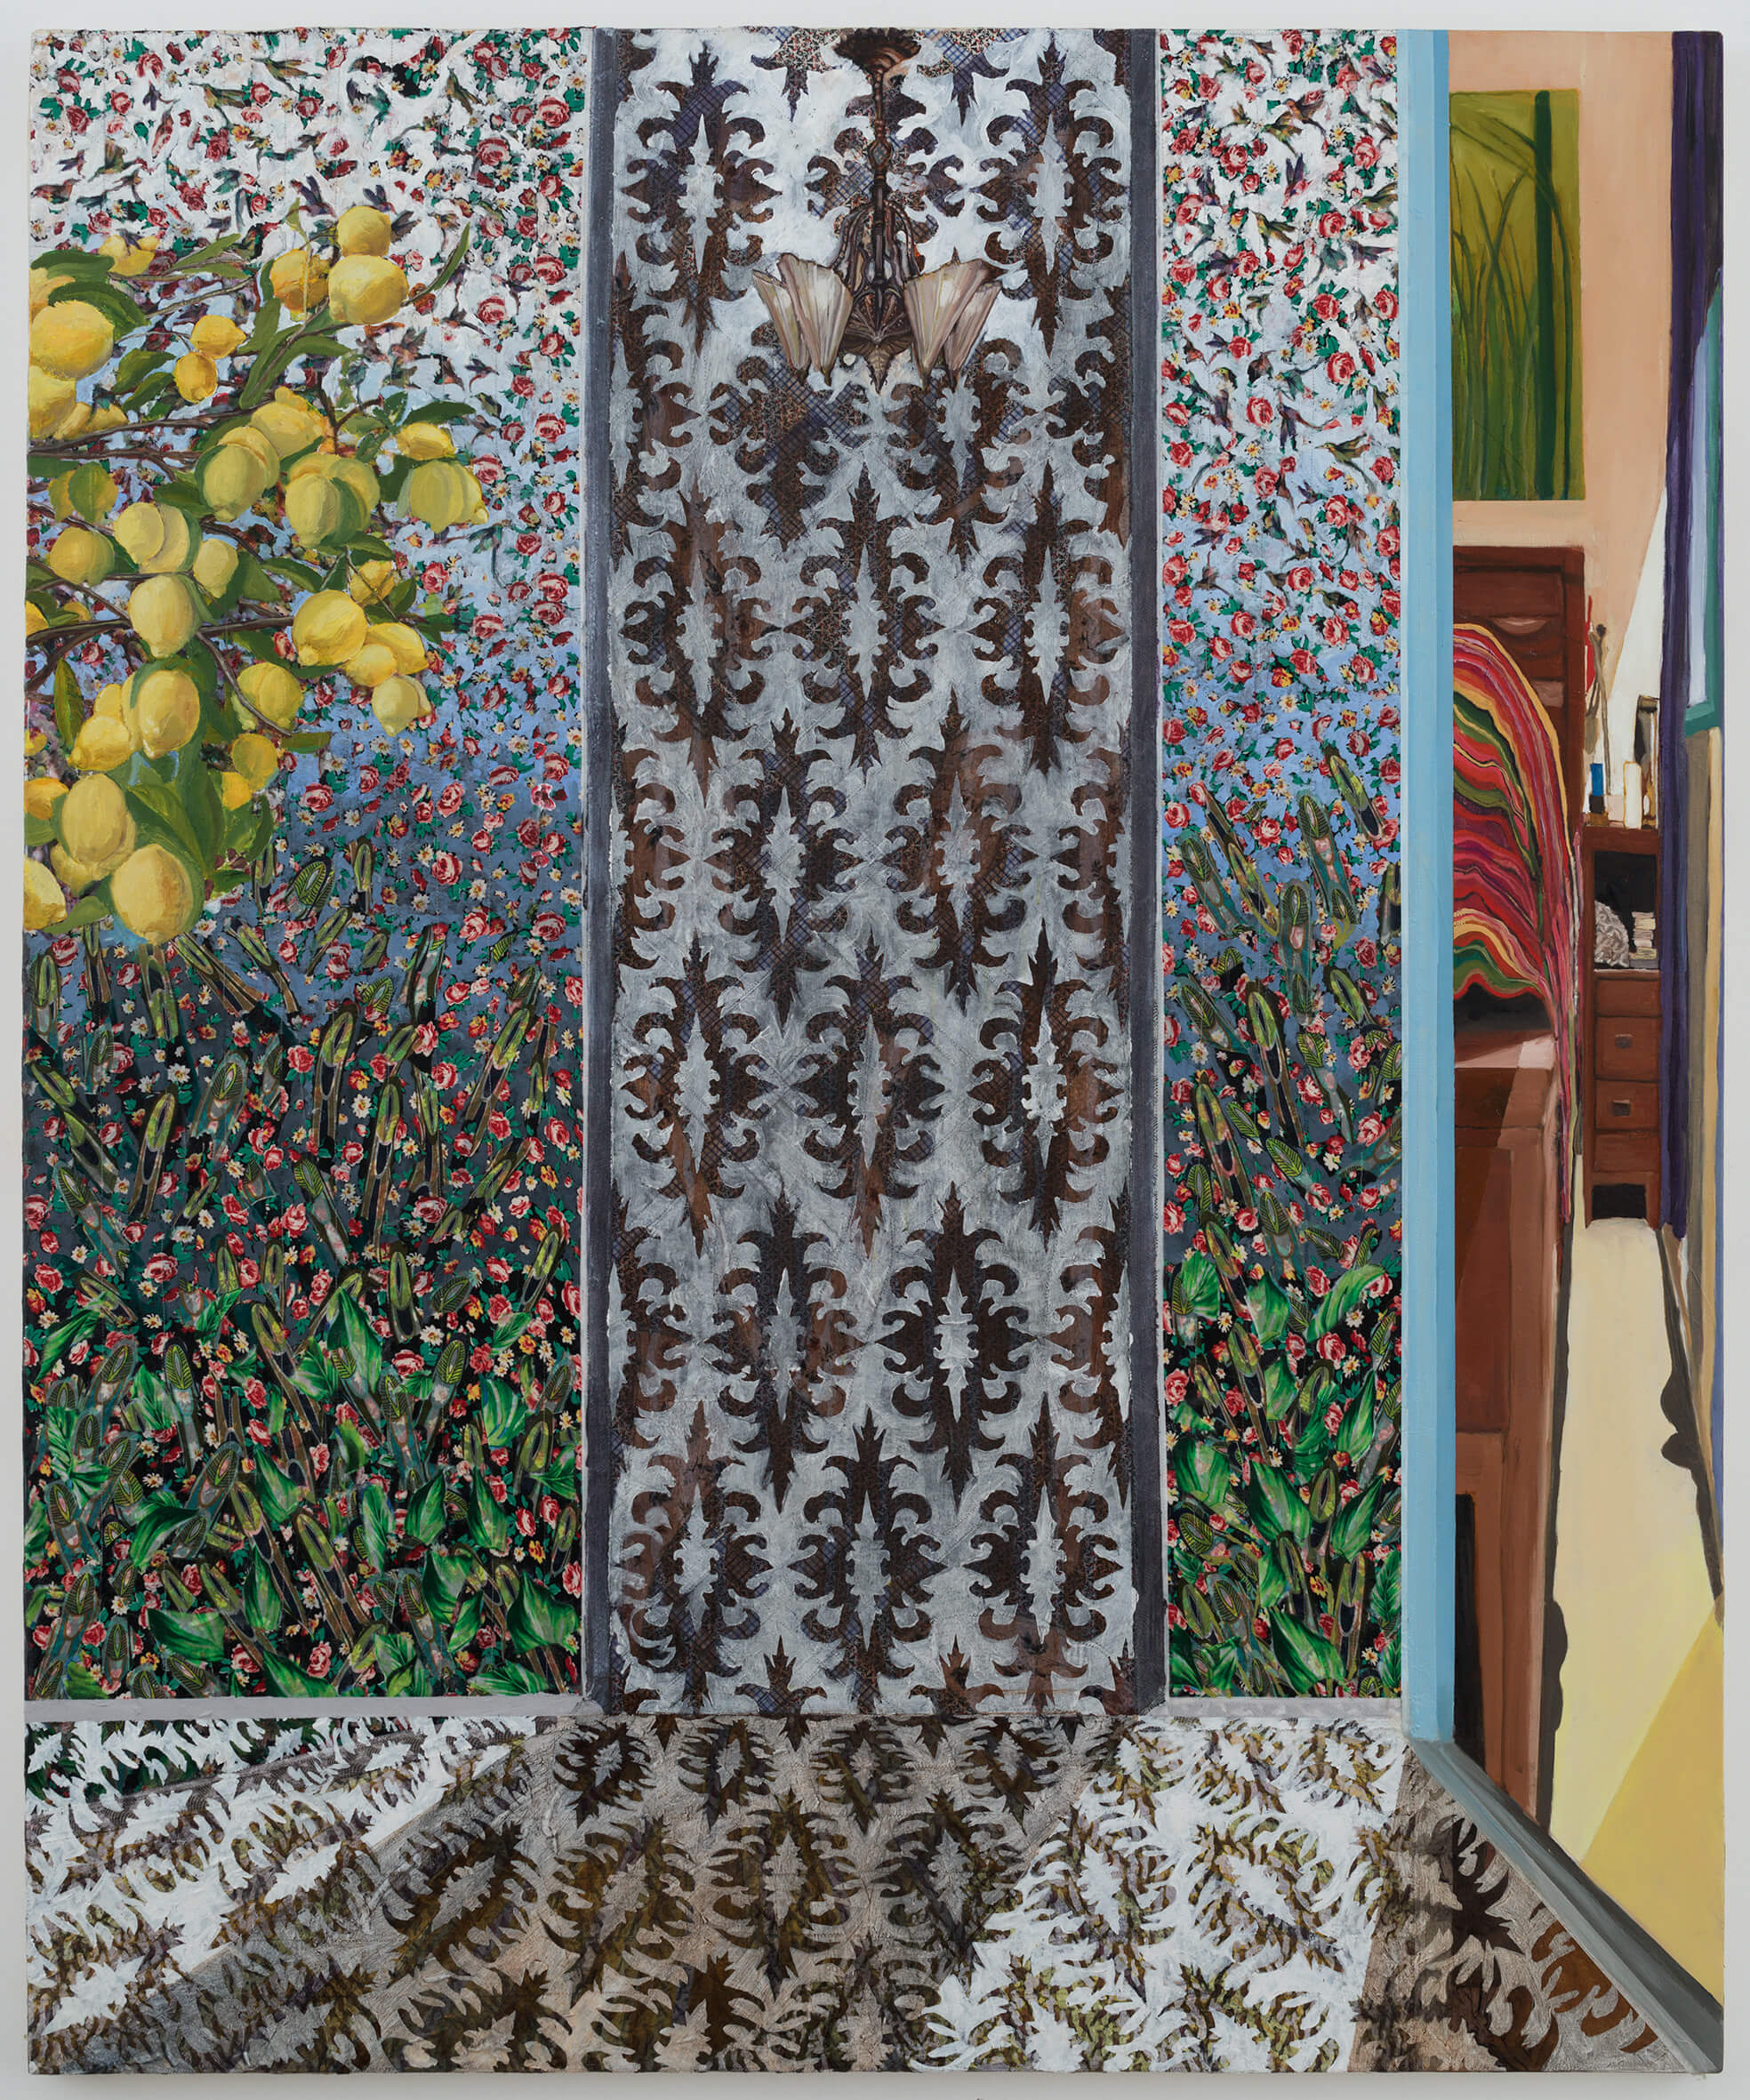 Ella Amitay Sadovsky, Glasshouse Green painting from Berkeley, bed and yellow lemons